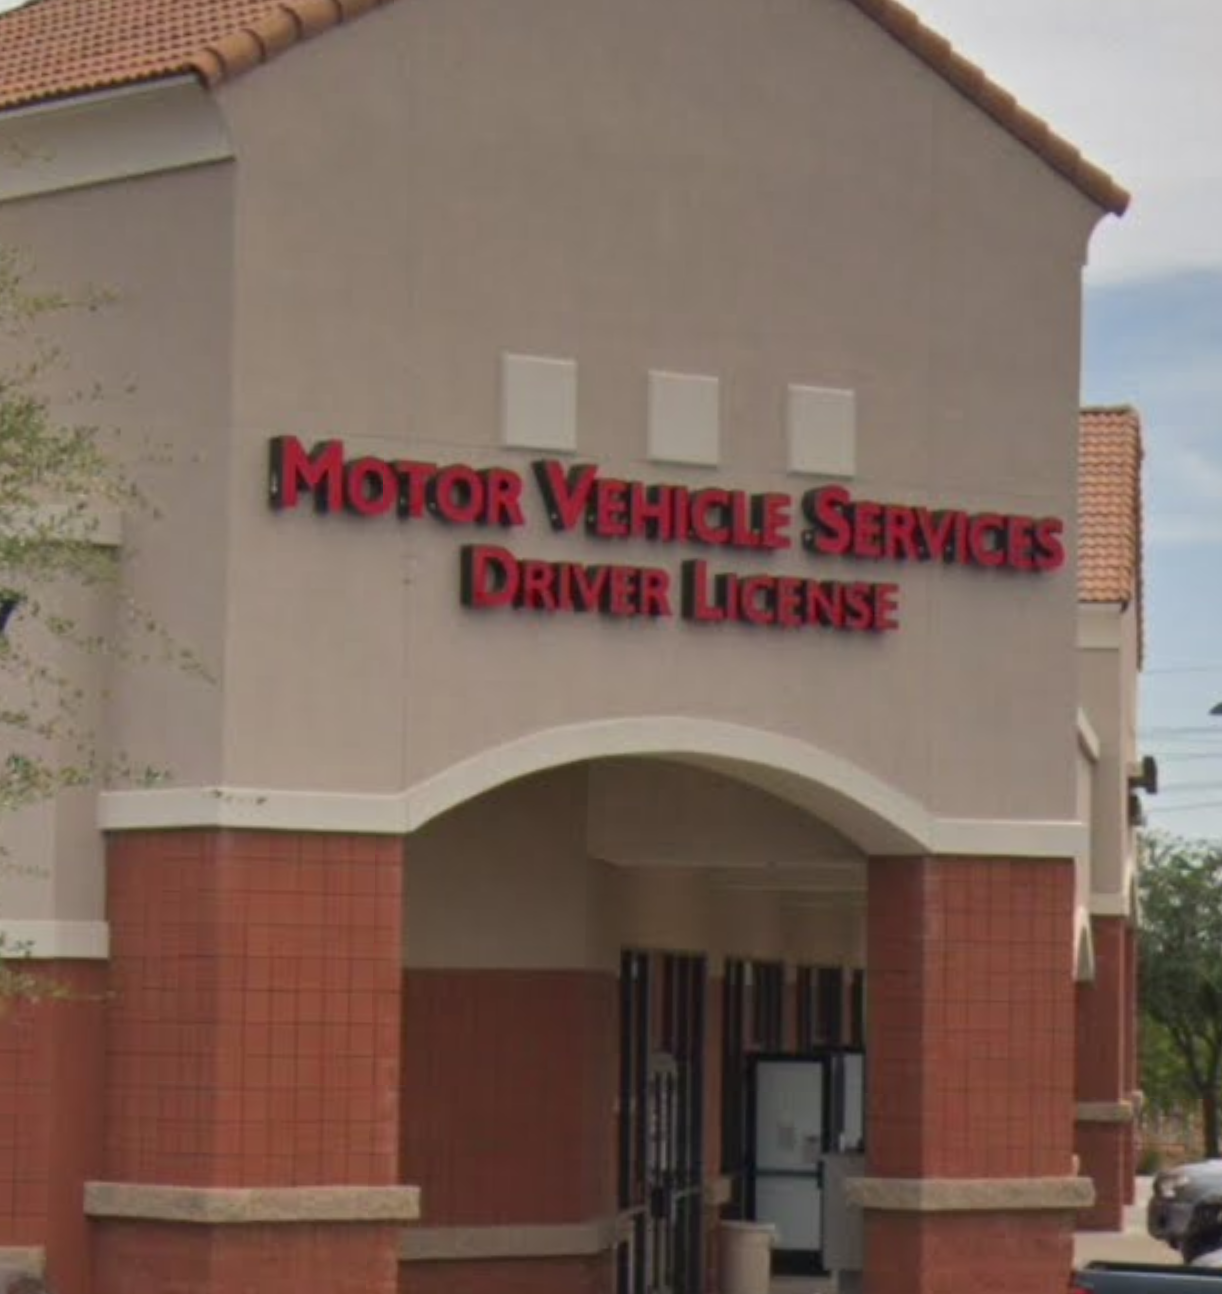 Arizona Auto License Services - Digital Cash 2 Go, Inc.